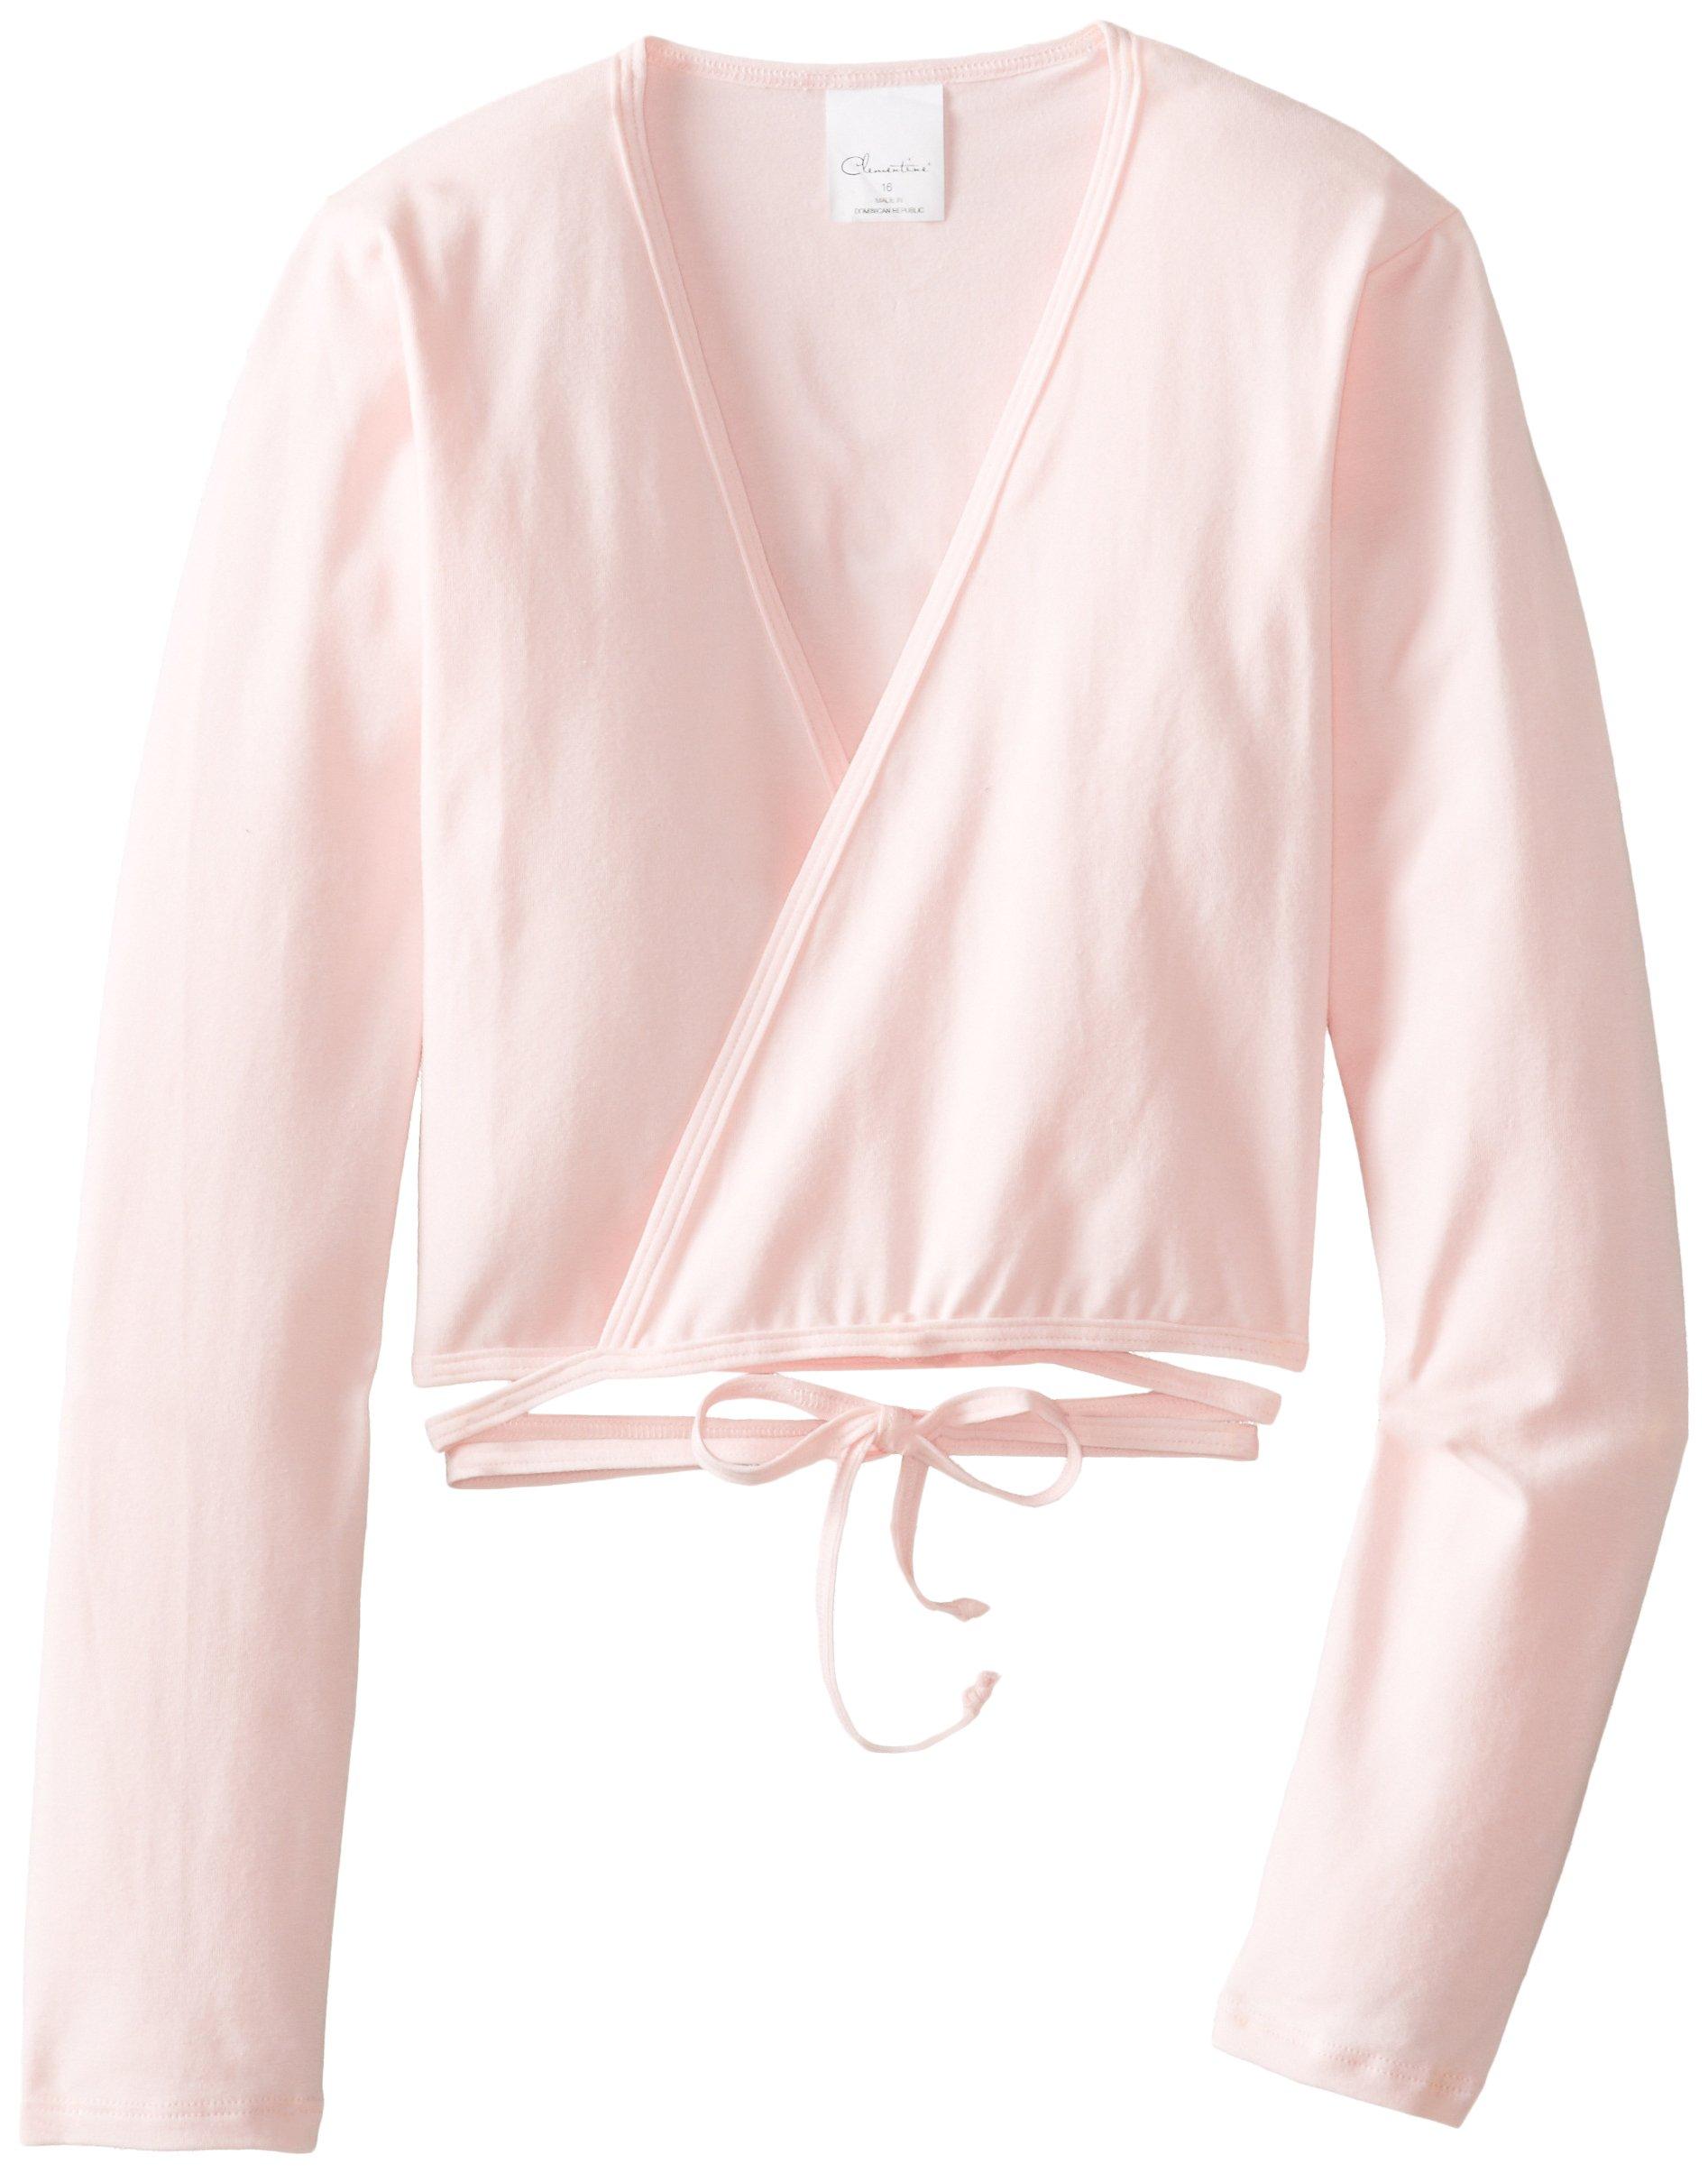 Clementine Little Girls' Long Sleeve Wrap Sweater, Light Pink, 4-6